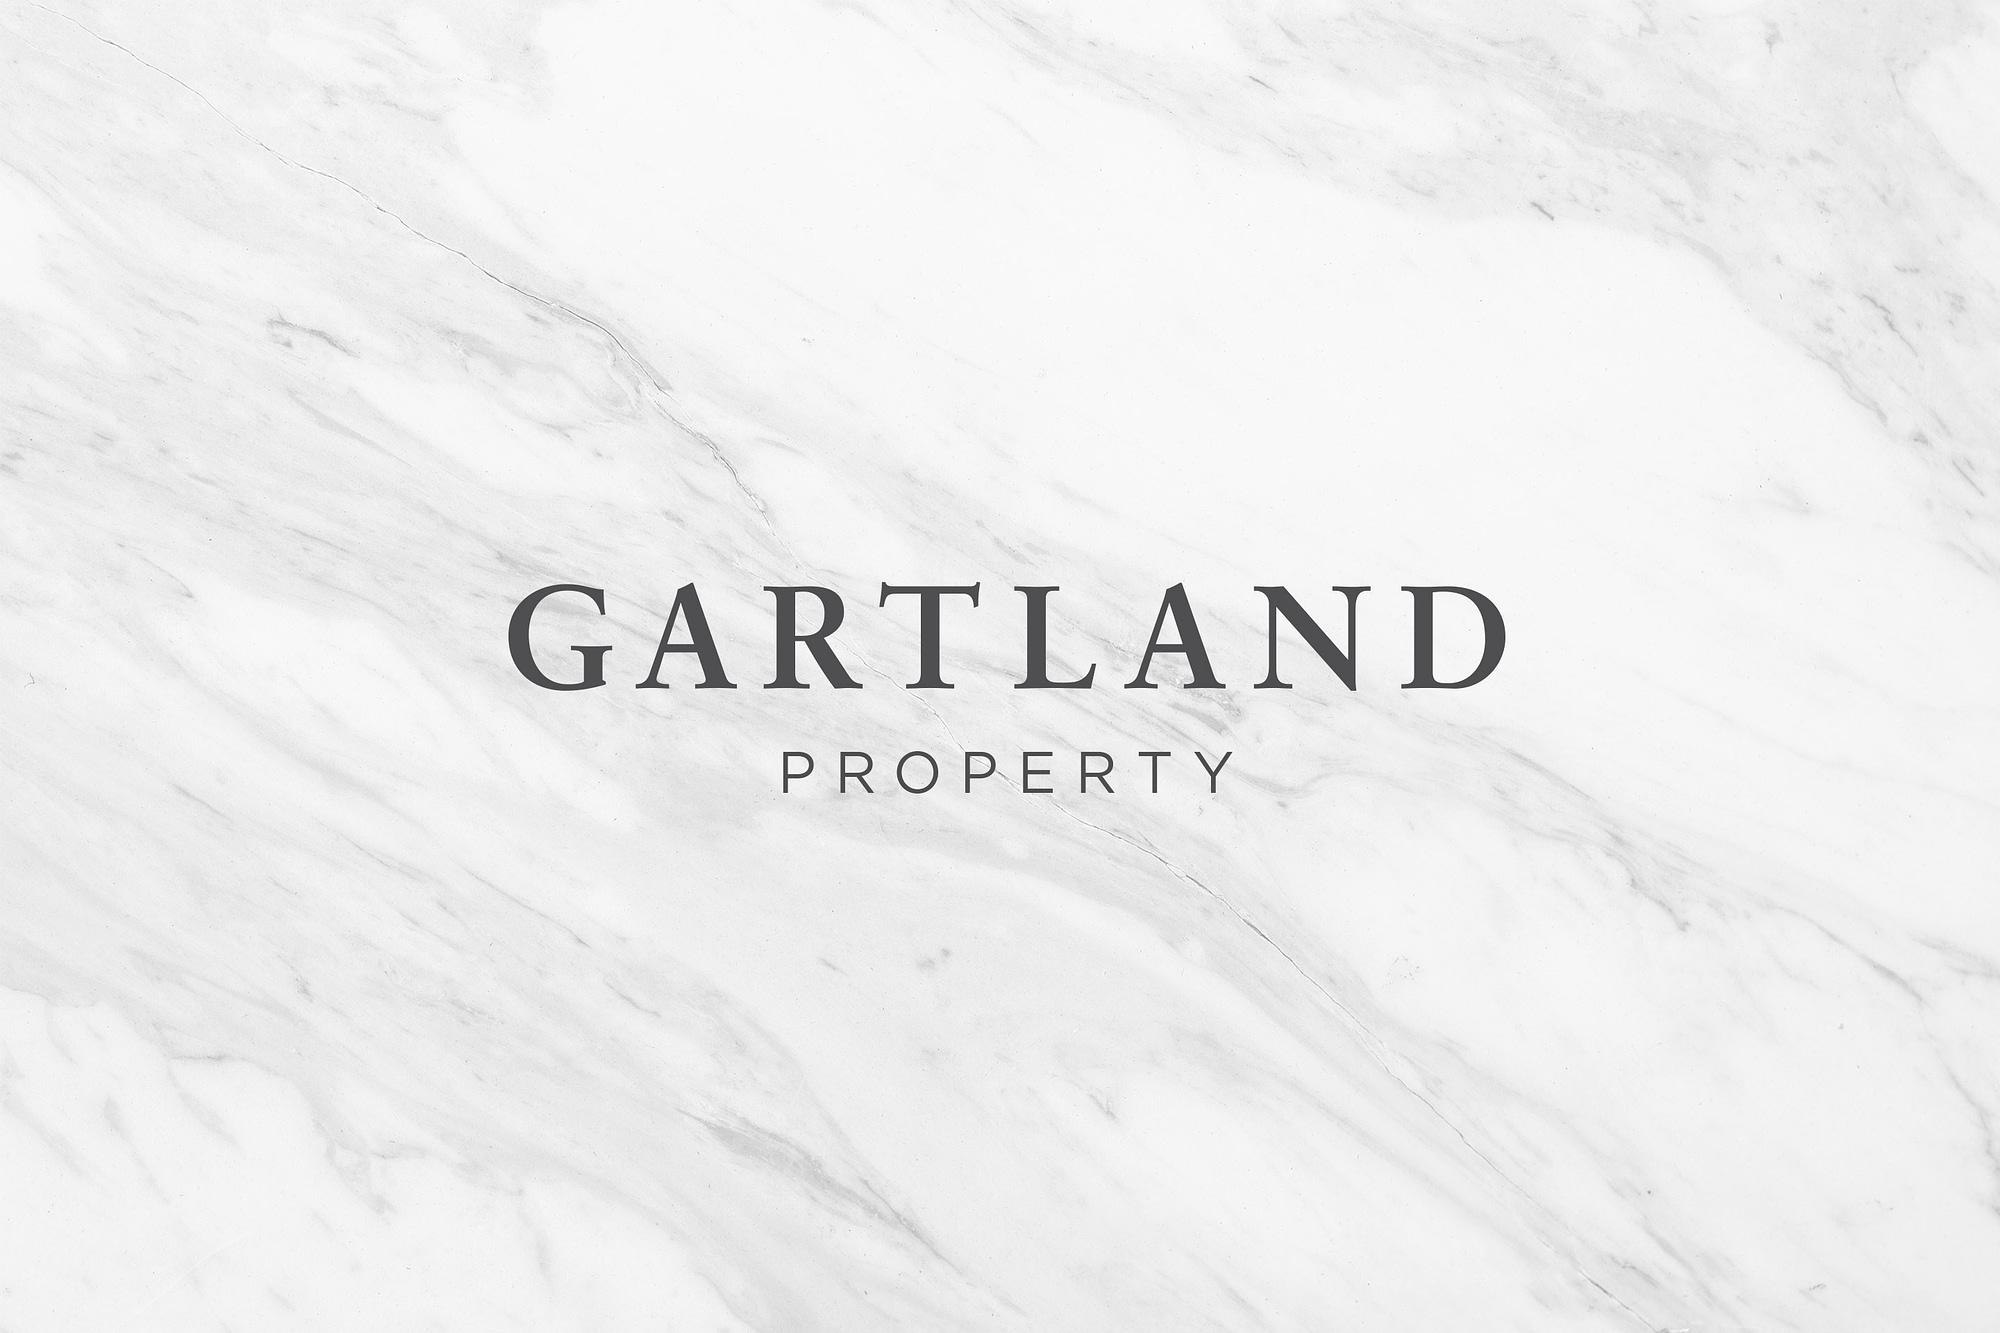 Gartland Property new brandmark